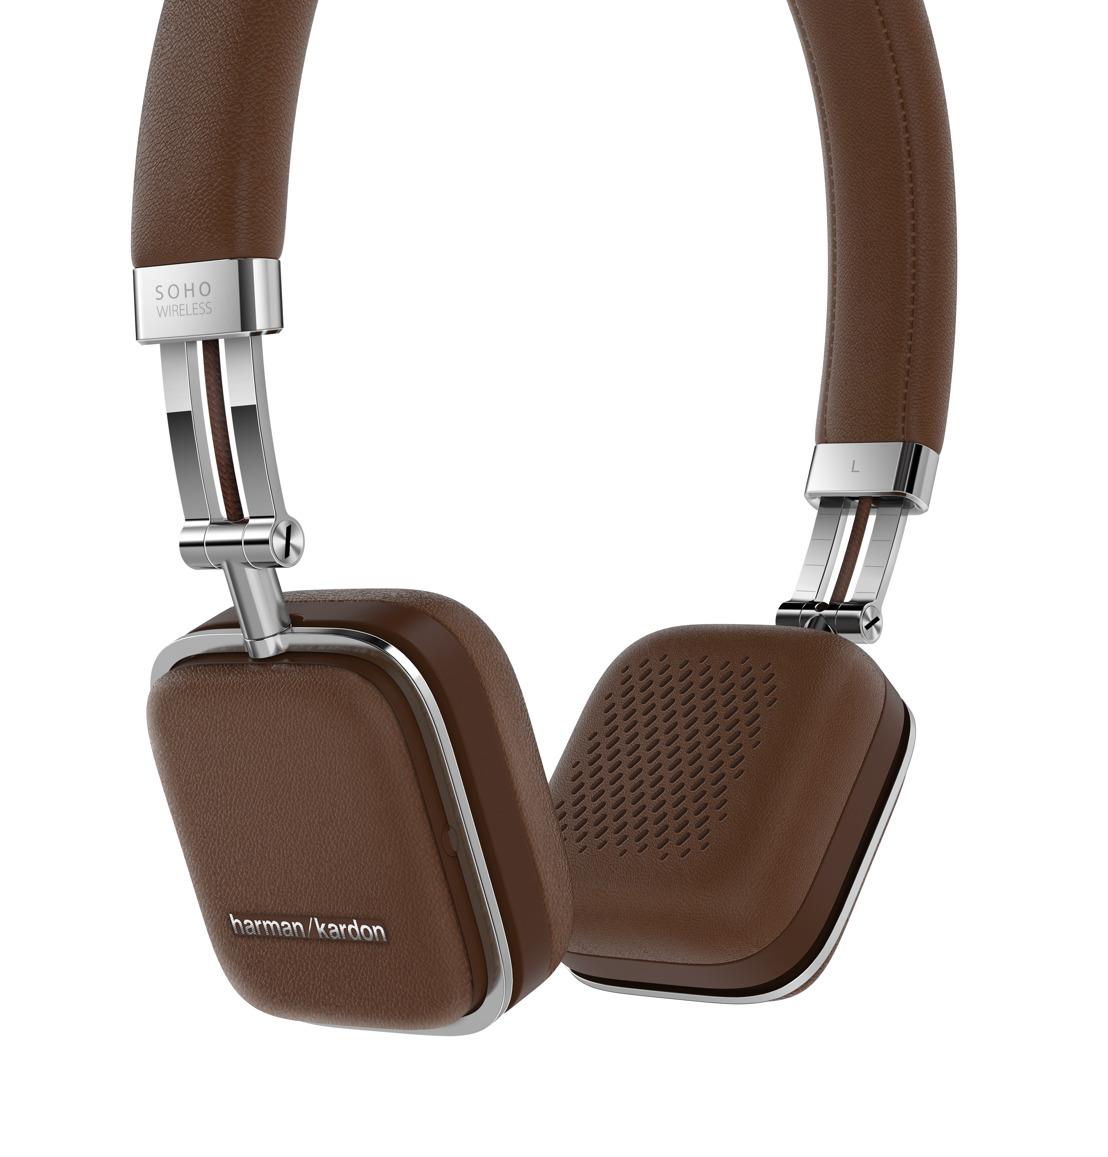 harman launches harman kardon soho wireless headphones at. Black Bedroom Furniture Sets. Home Design Ideas